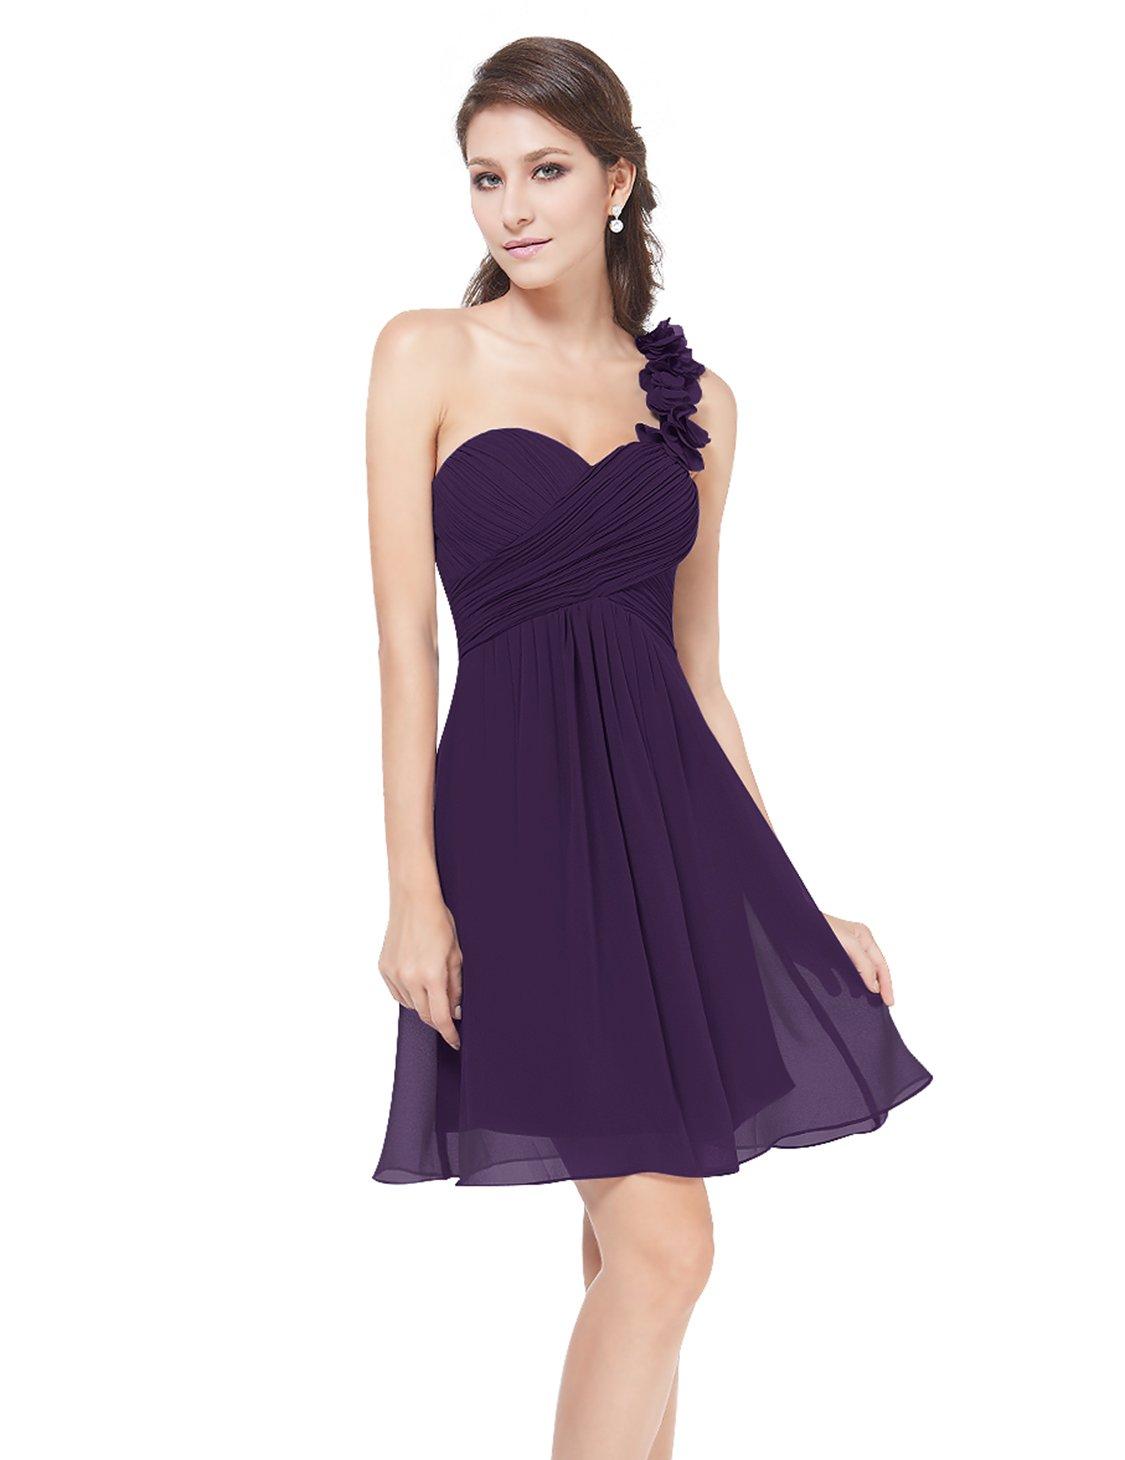 Ever-Pretty Juniors One Shoulder Knee Length Bridesmaids Dress 6 US Purple